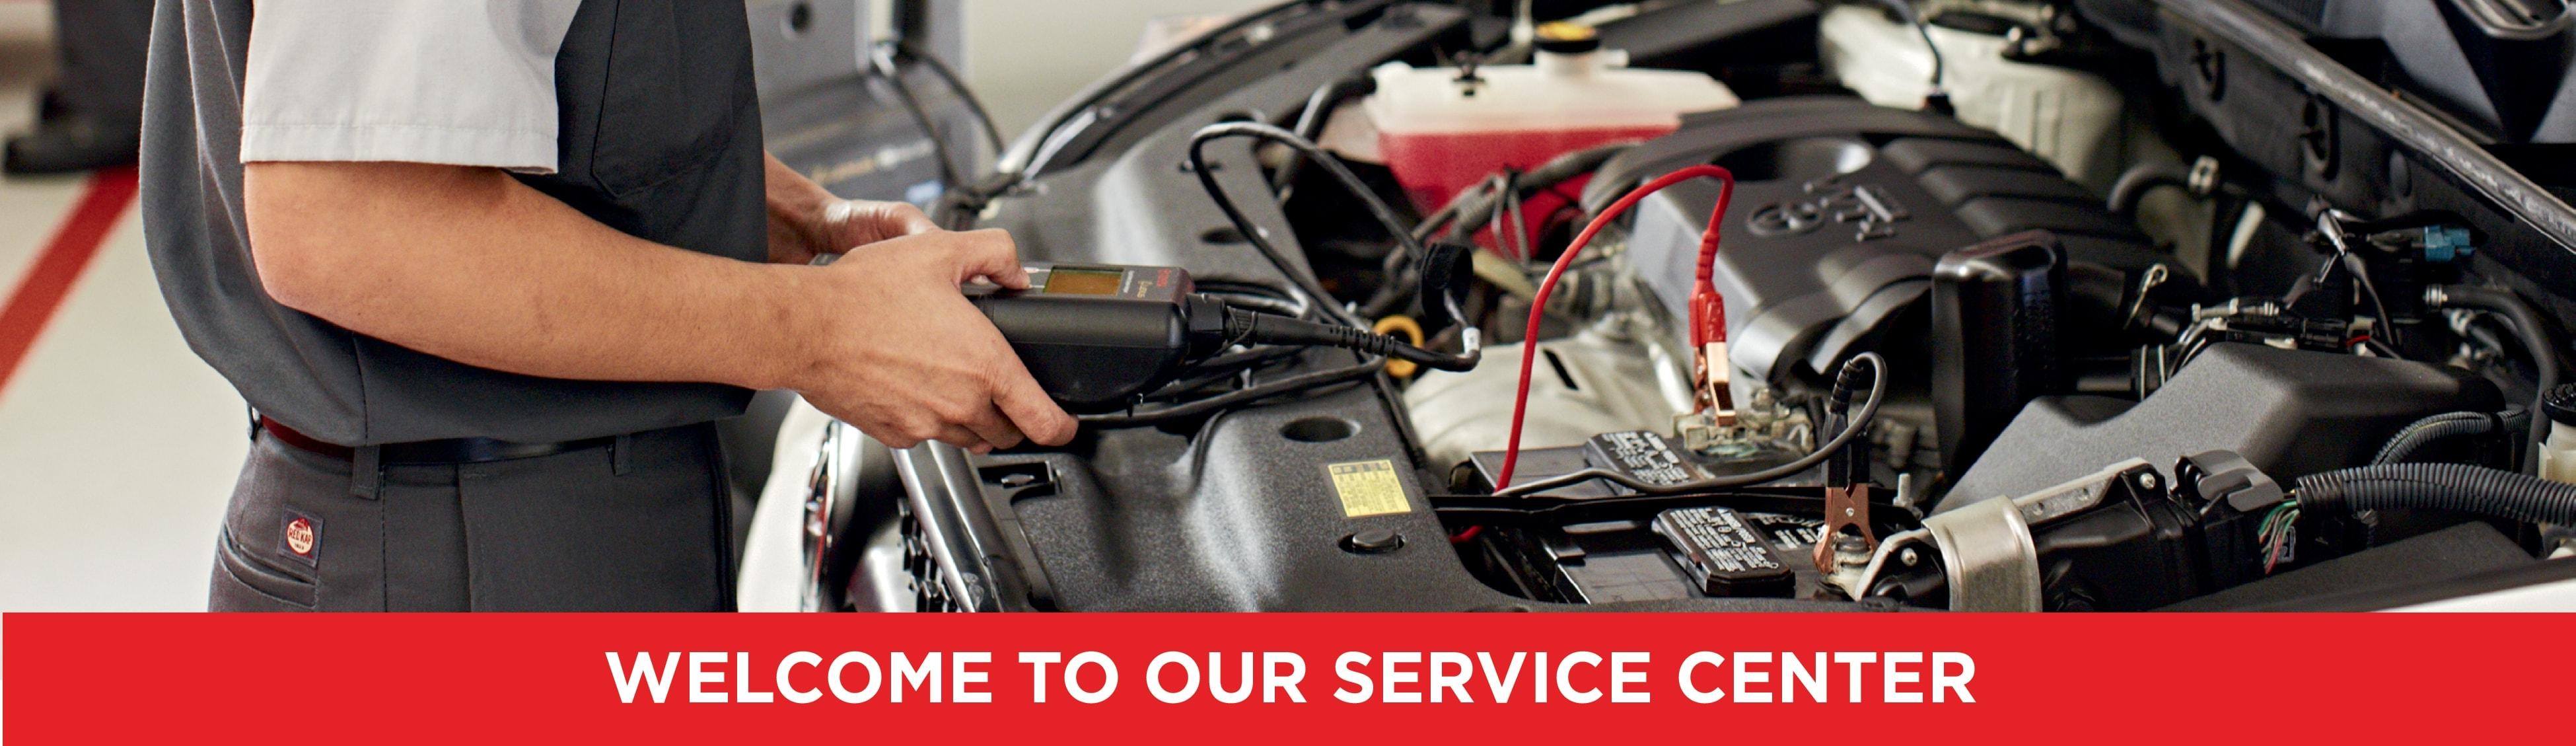 Toyota Lakewood Nj >> Service Center in Lakewod NJ   Toyota World of Lakewood